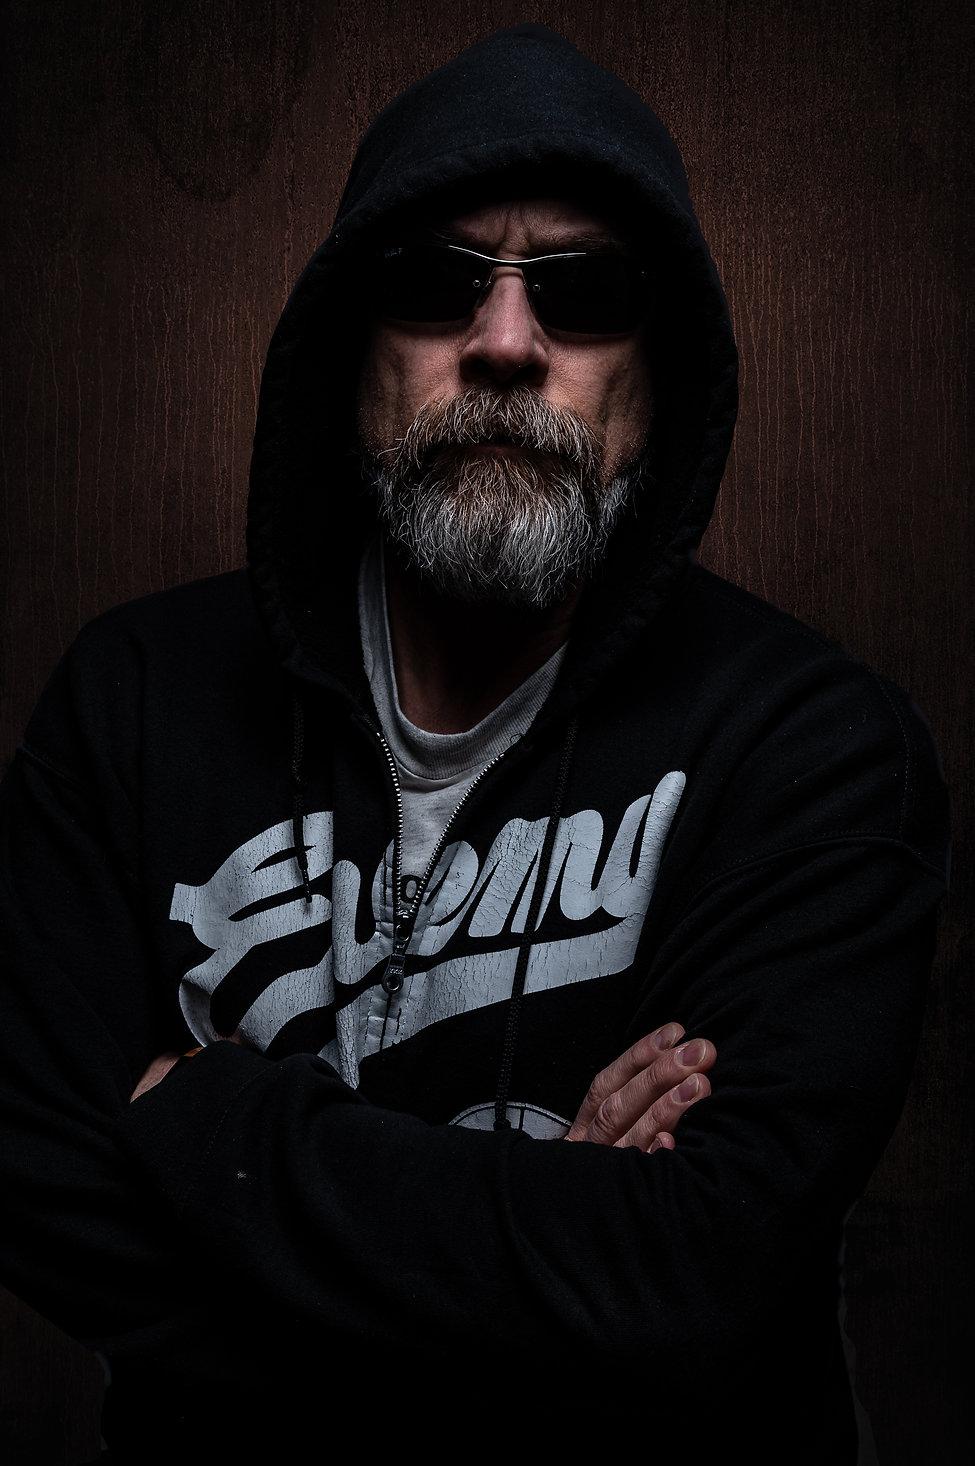 man-wearing-black-and-white-hooded-jacke